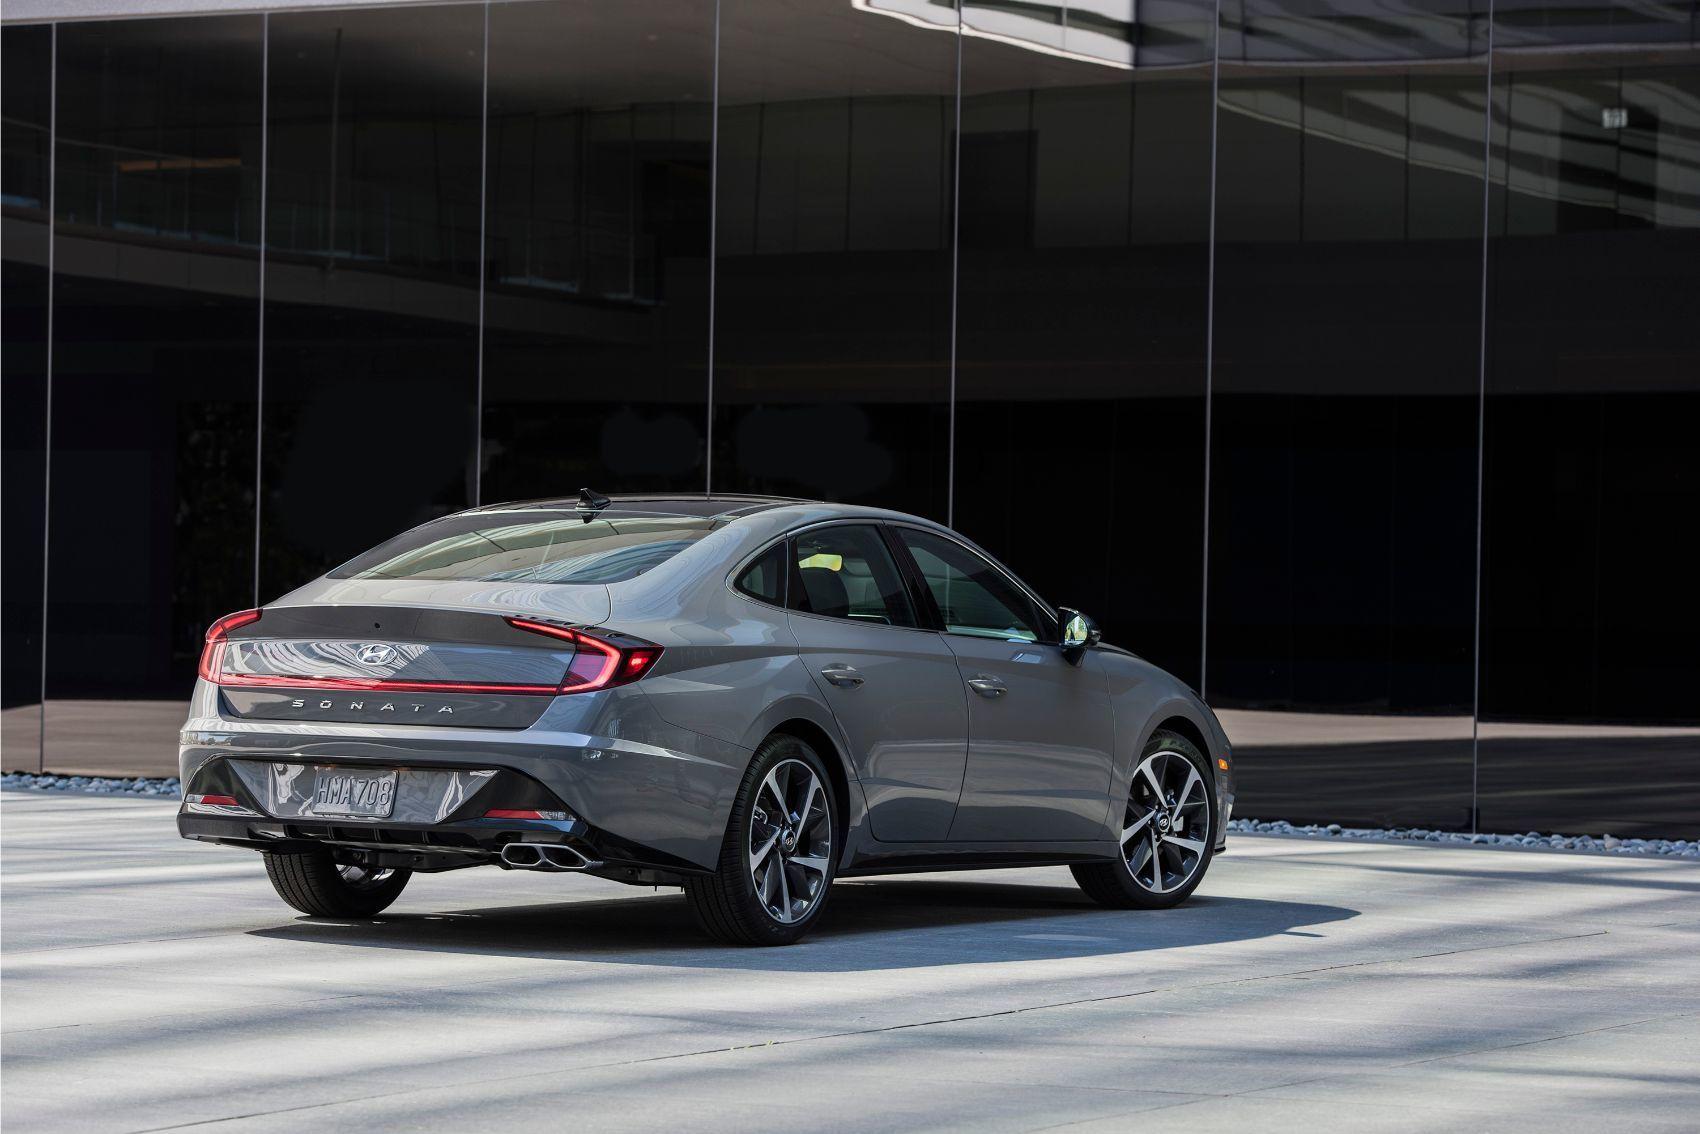 2020 Hyundai Sonata: Right On The Money (Again)